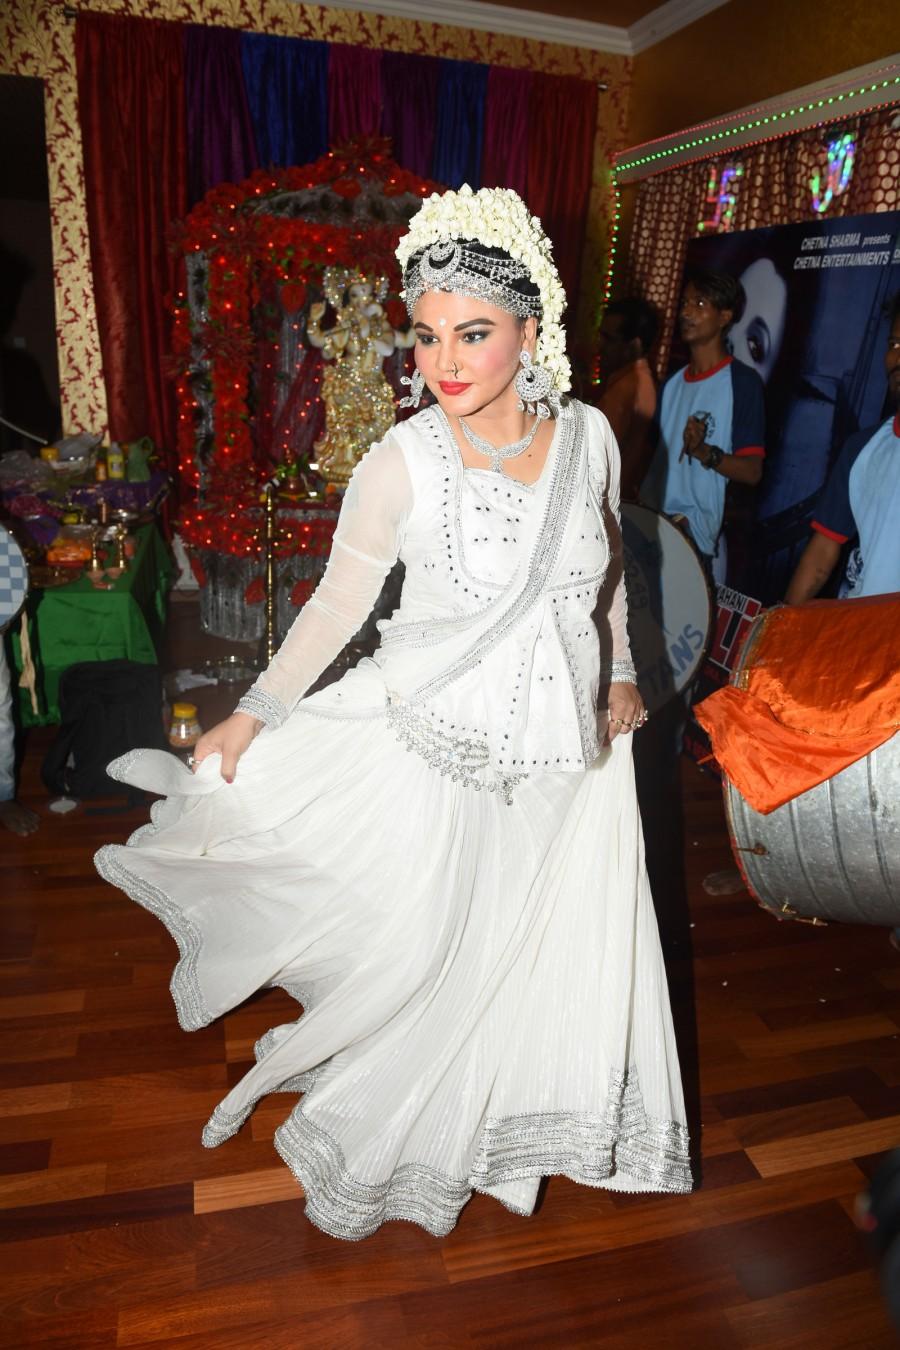 Rakhi Sawant,Rakhi Sawant celebrates Ganesh Chaturthi,Ganesh Chaturthi,Ganesh Chaturthi celebrations,Rakhi Sawant pics,Rakhi Sawant images,Rakhi Sawant photos,Rakhi Sawant pictures